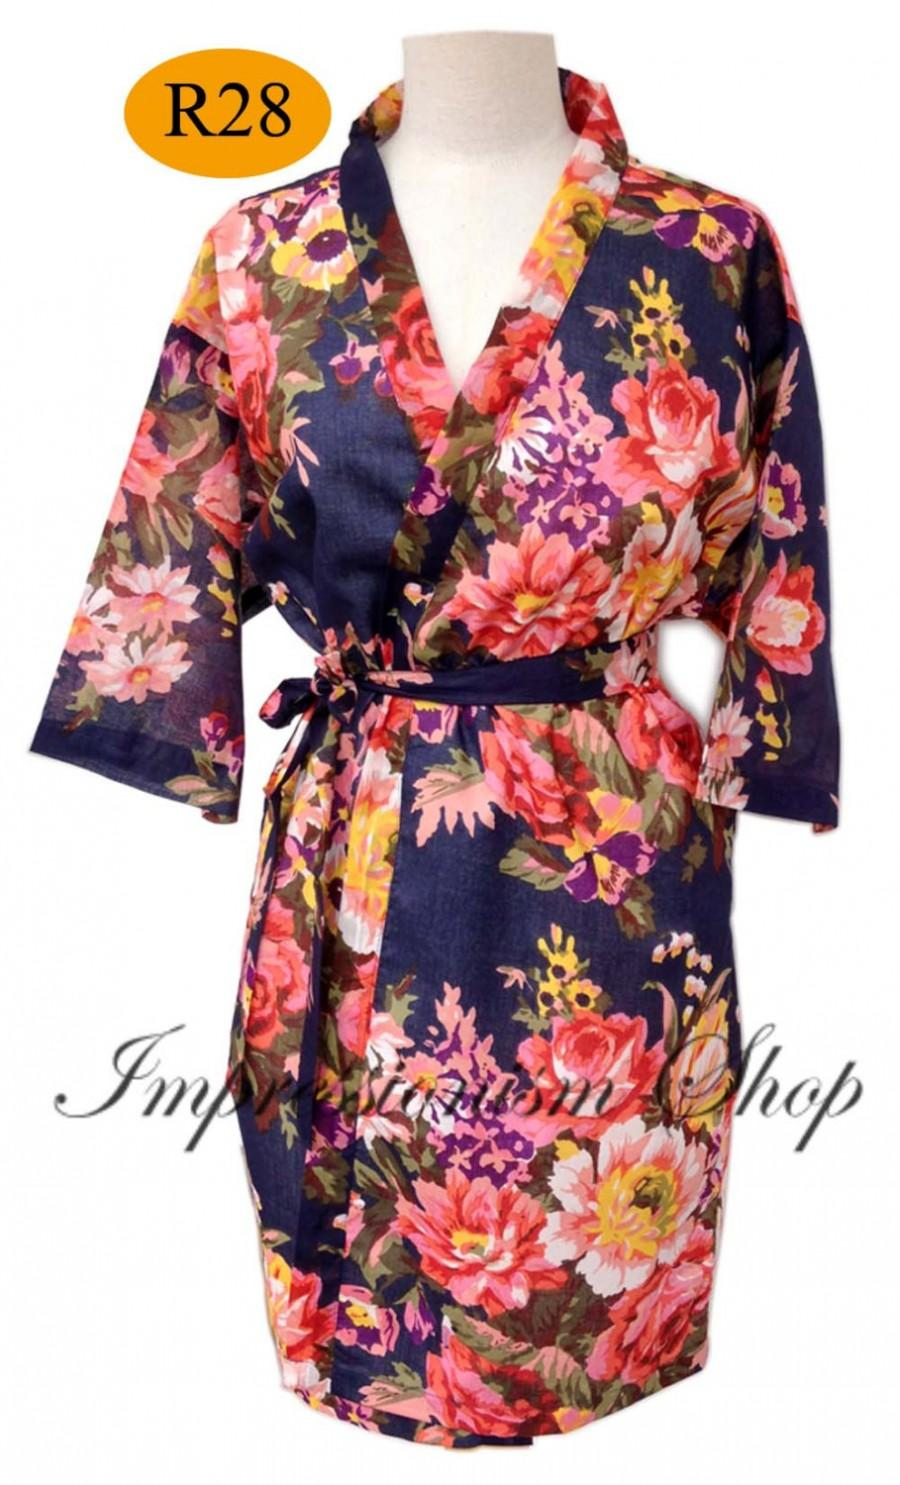 60cdfc616270b Navy Blue Robes, Bride Kimono, Kimono dress, Maid of honor, Spa robe beach,  Bachelorette party, kimono robe, bridesmaids robes